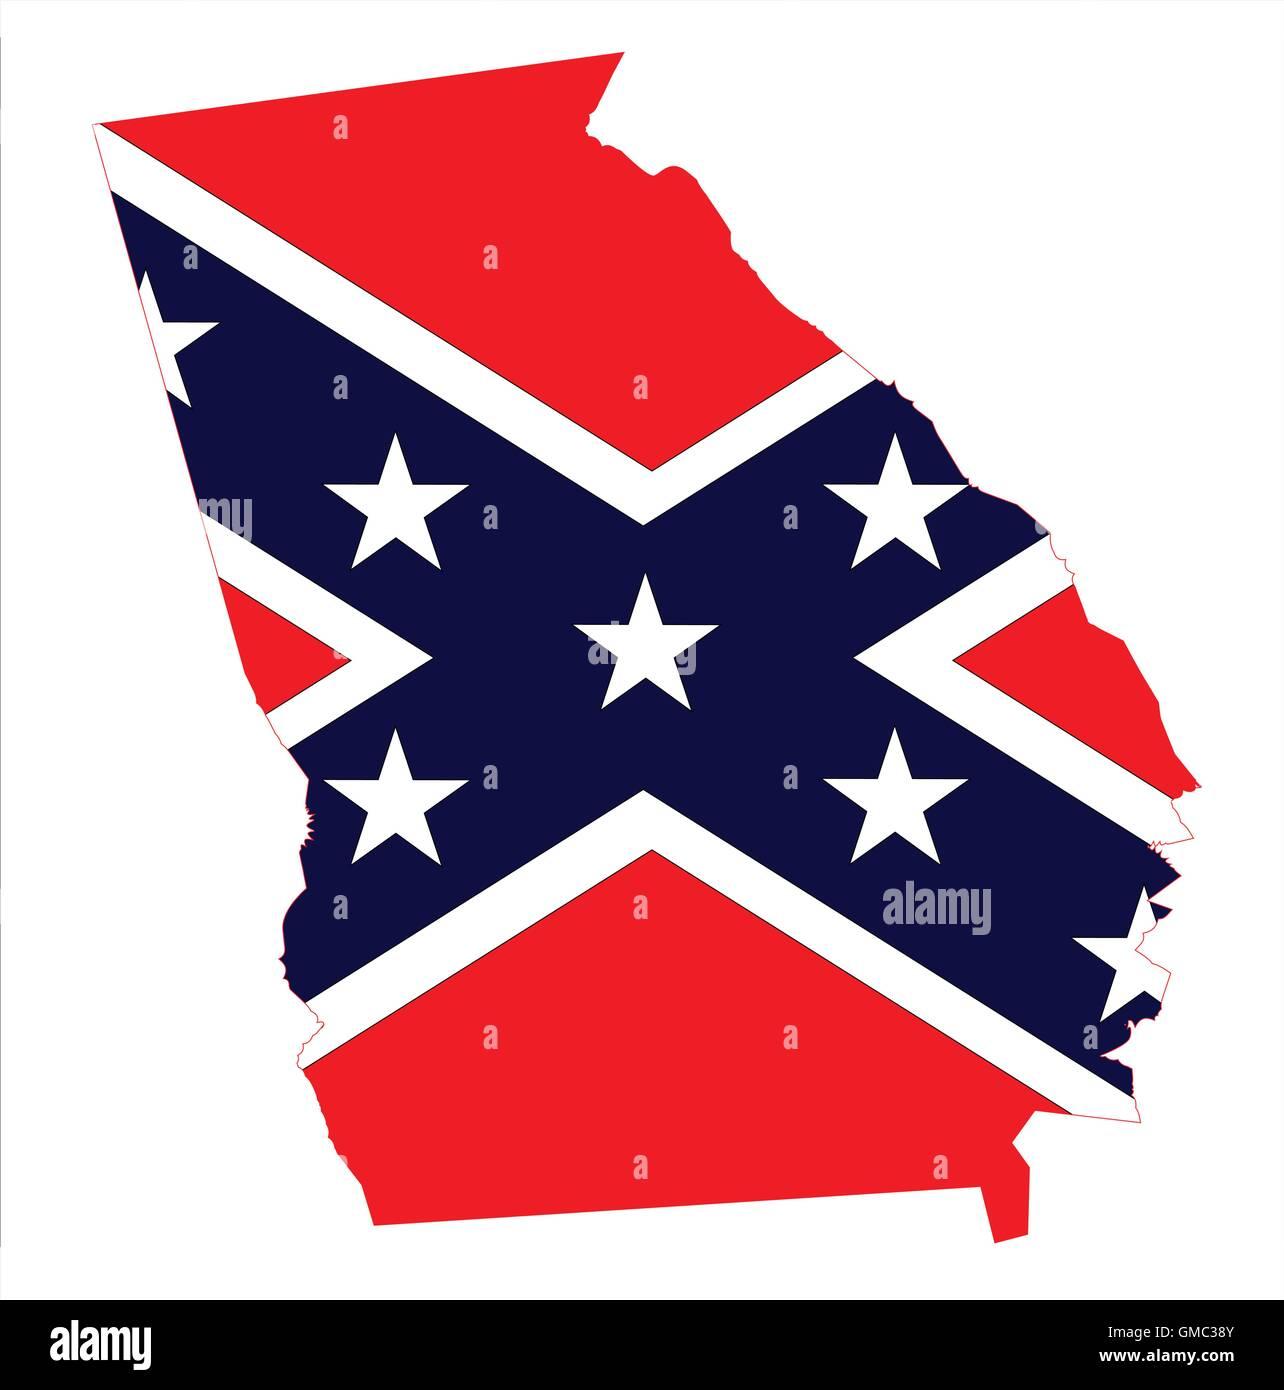 Georgia Map And Confederate Flag Stock Vector Art